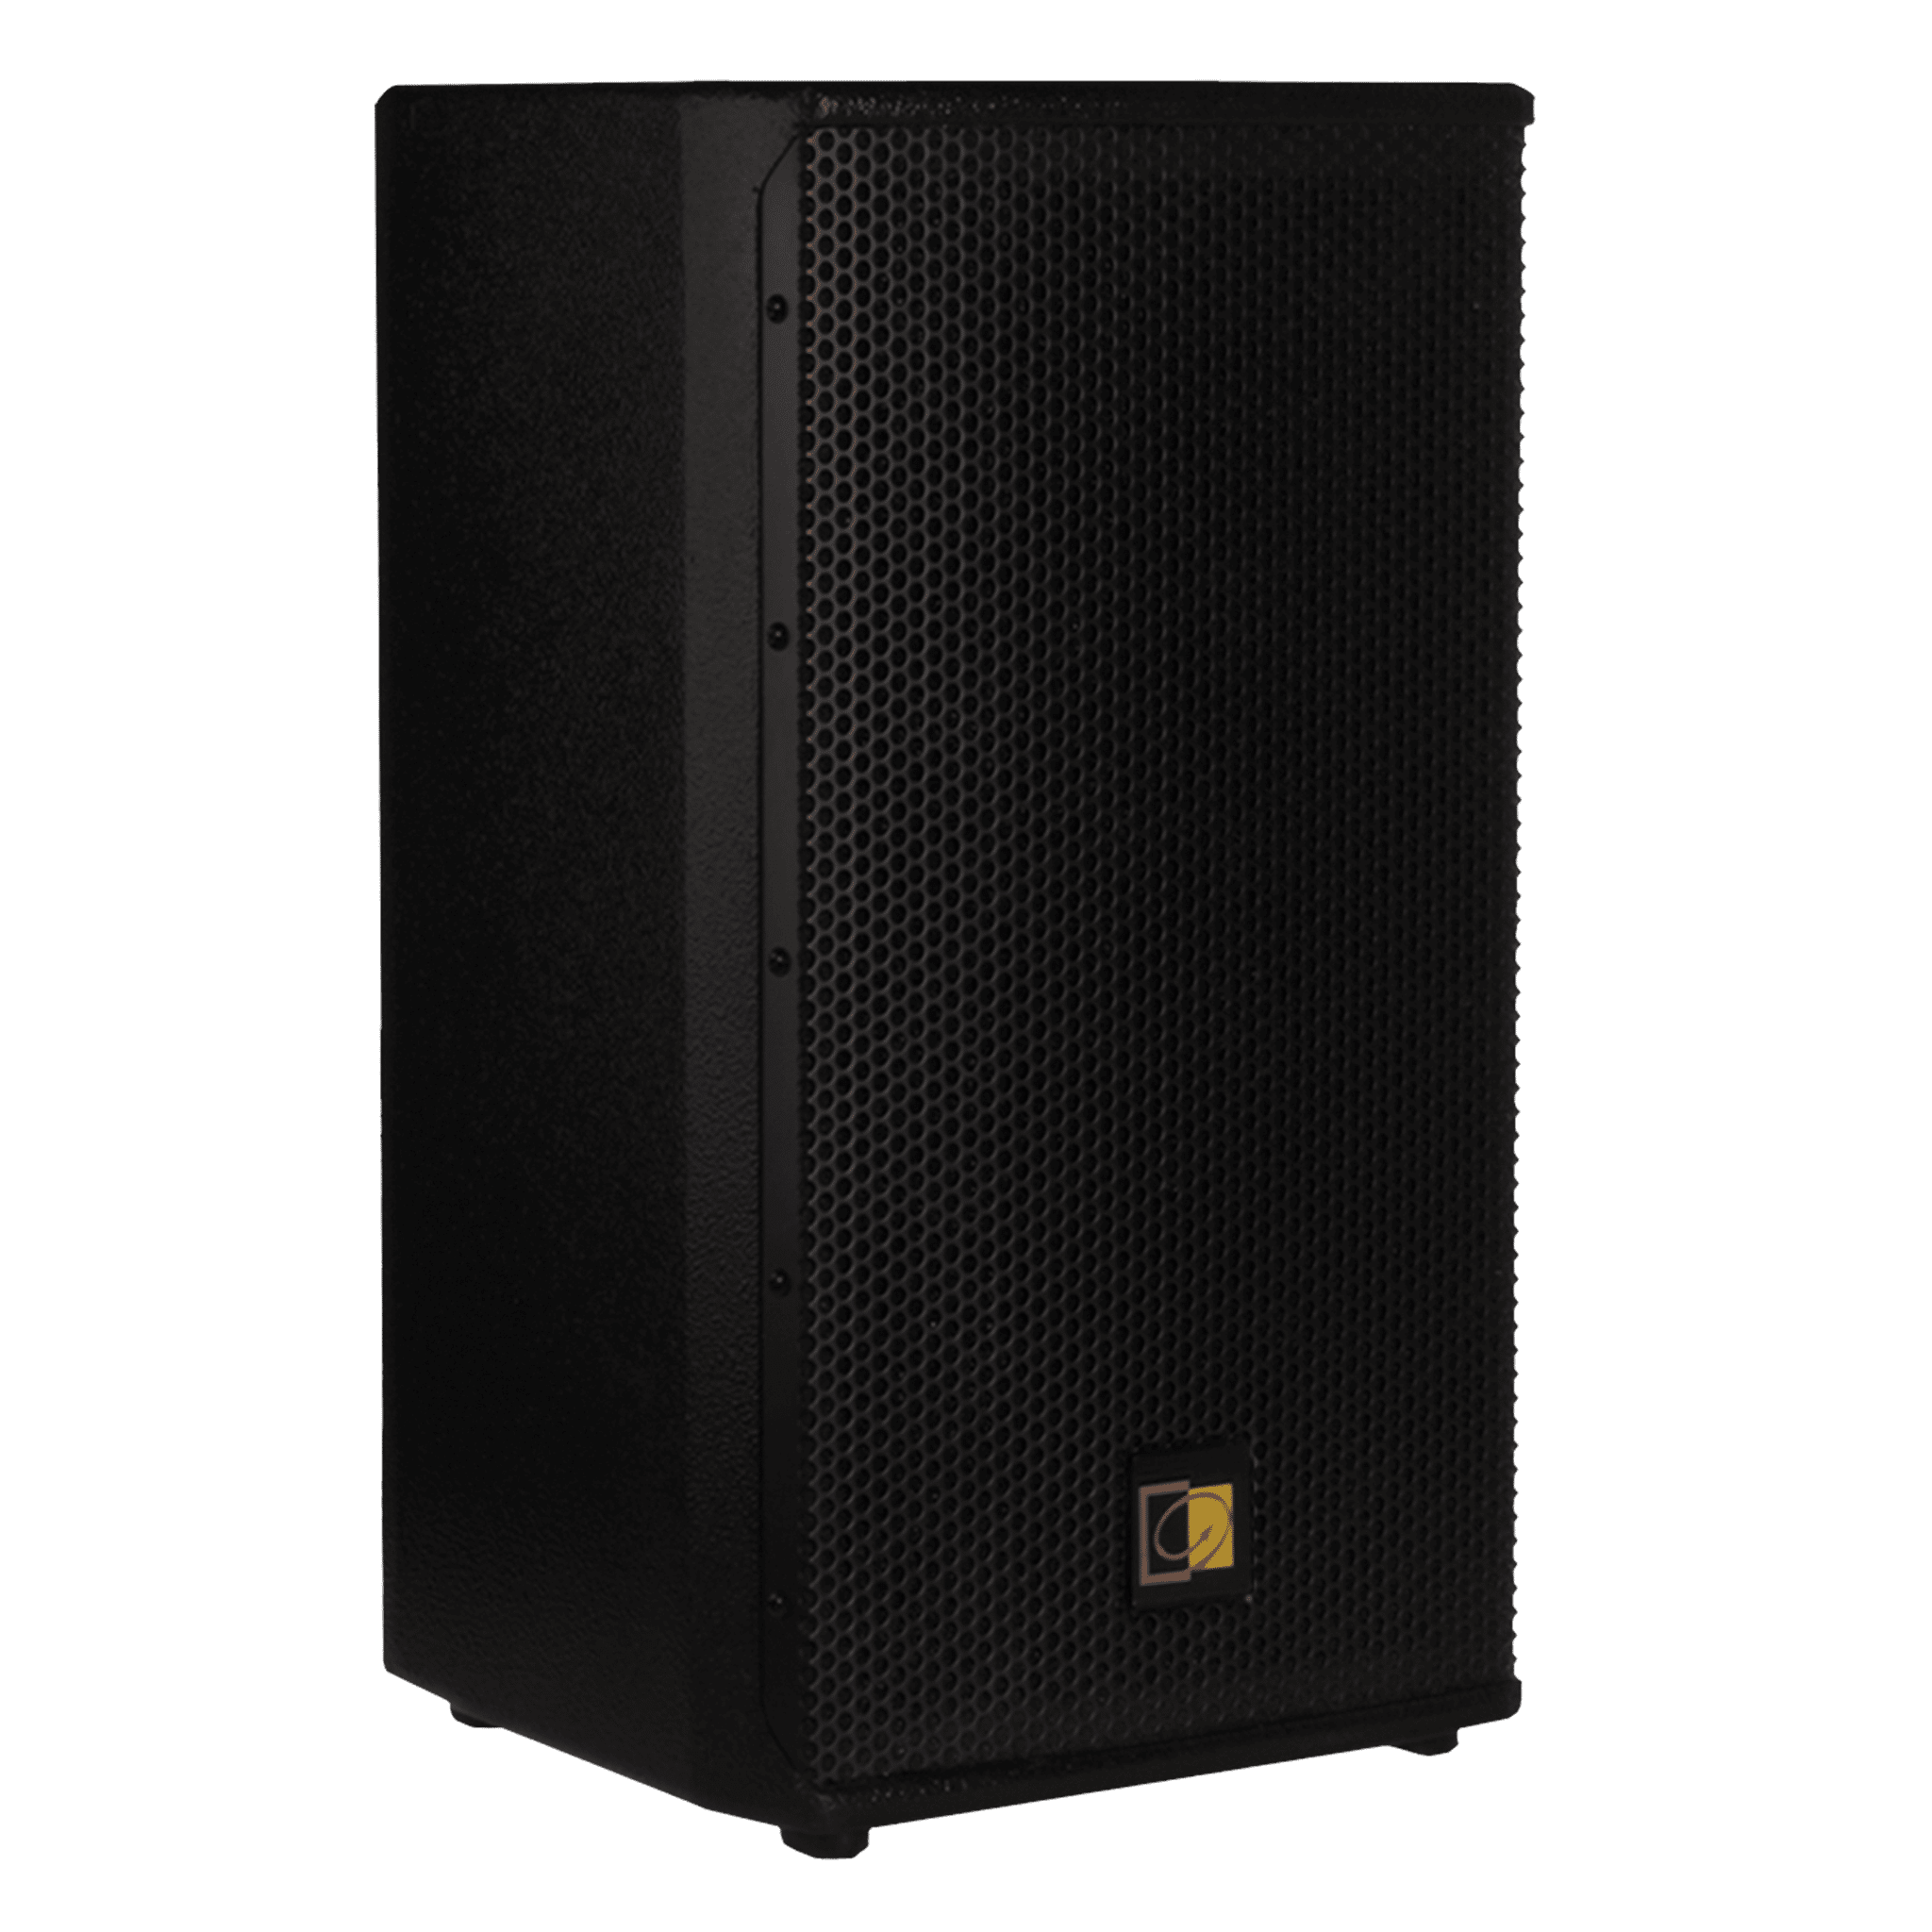 PX110MK2 - Black version